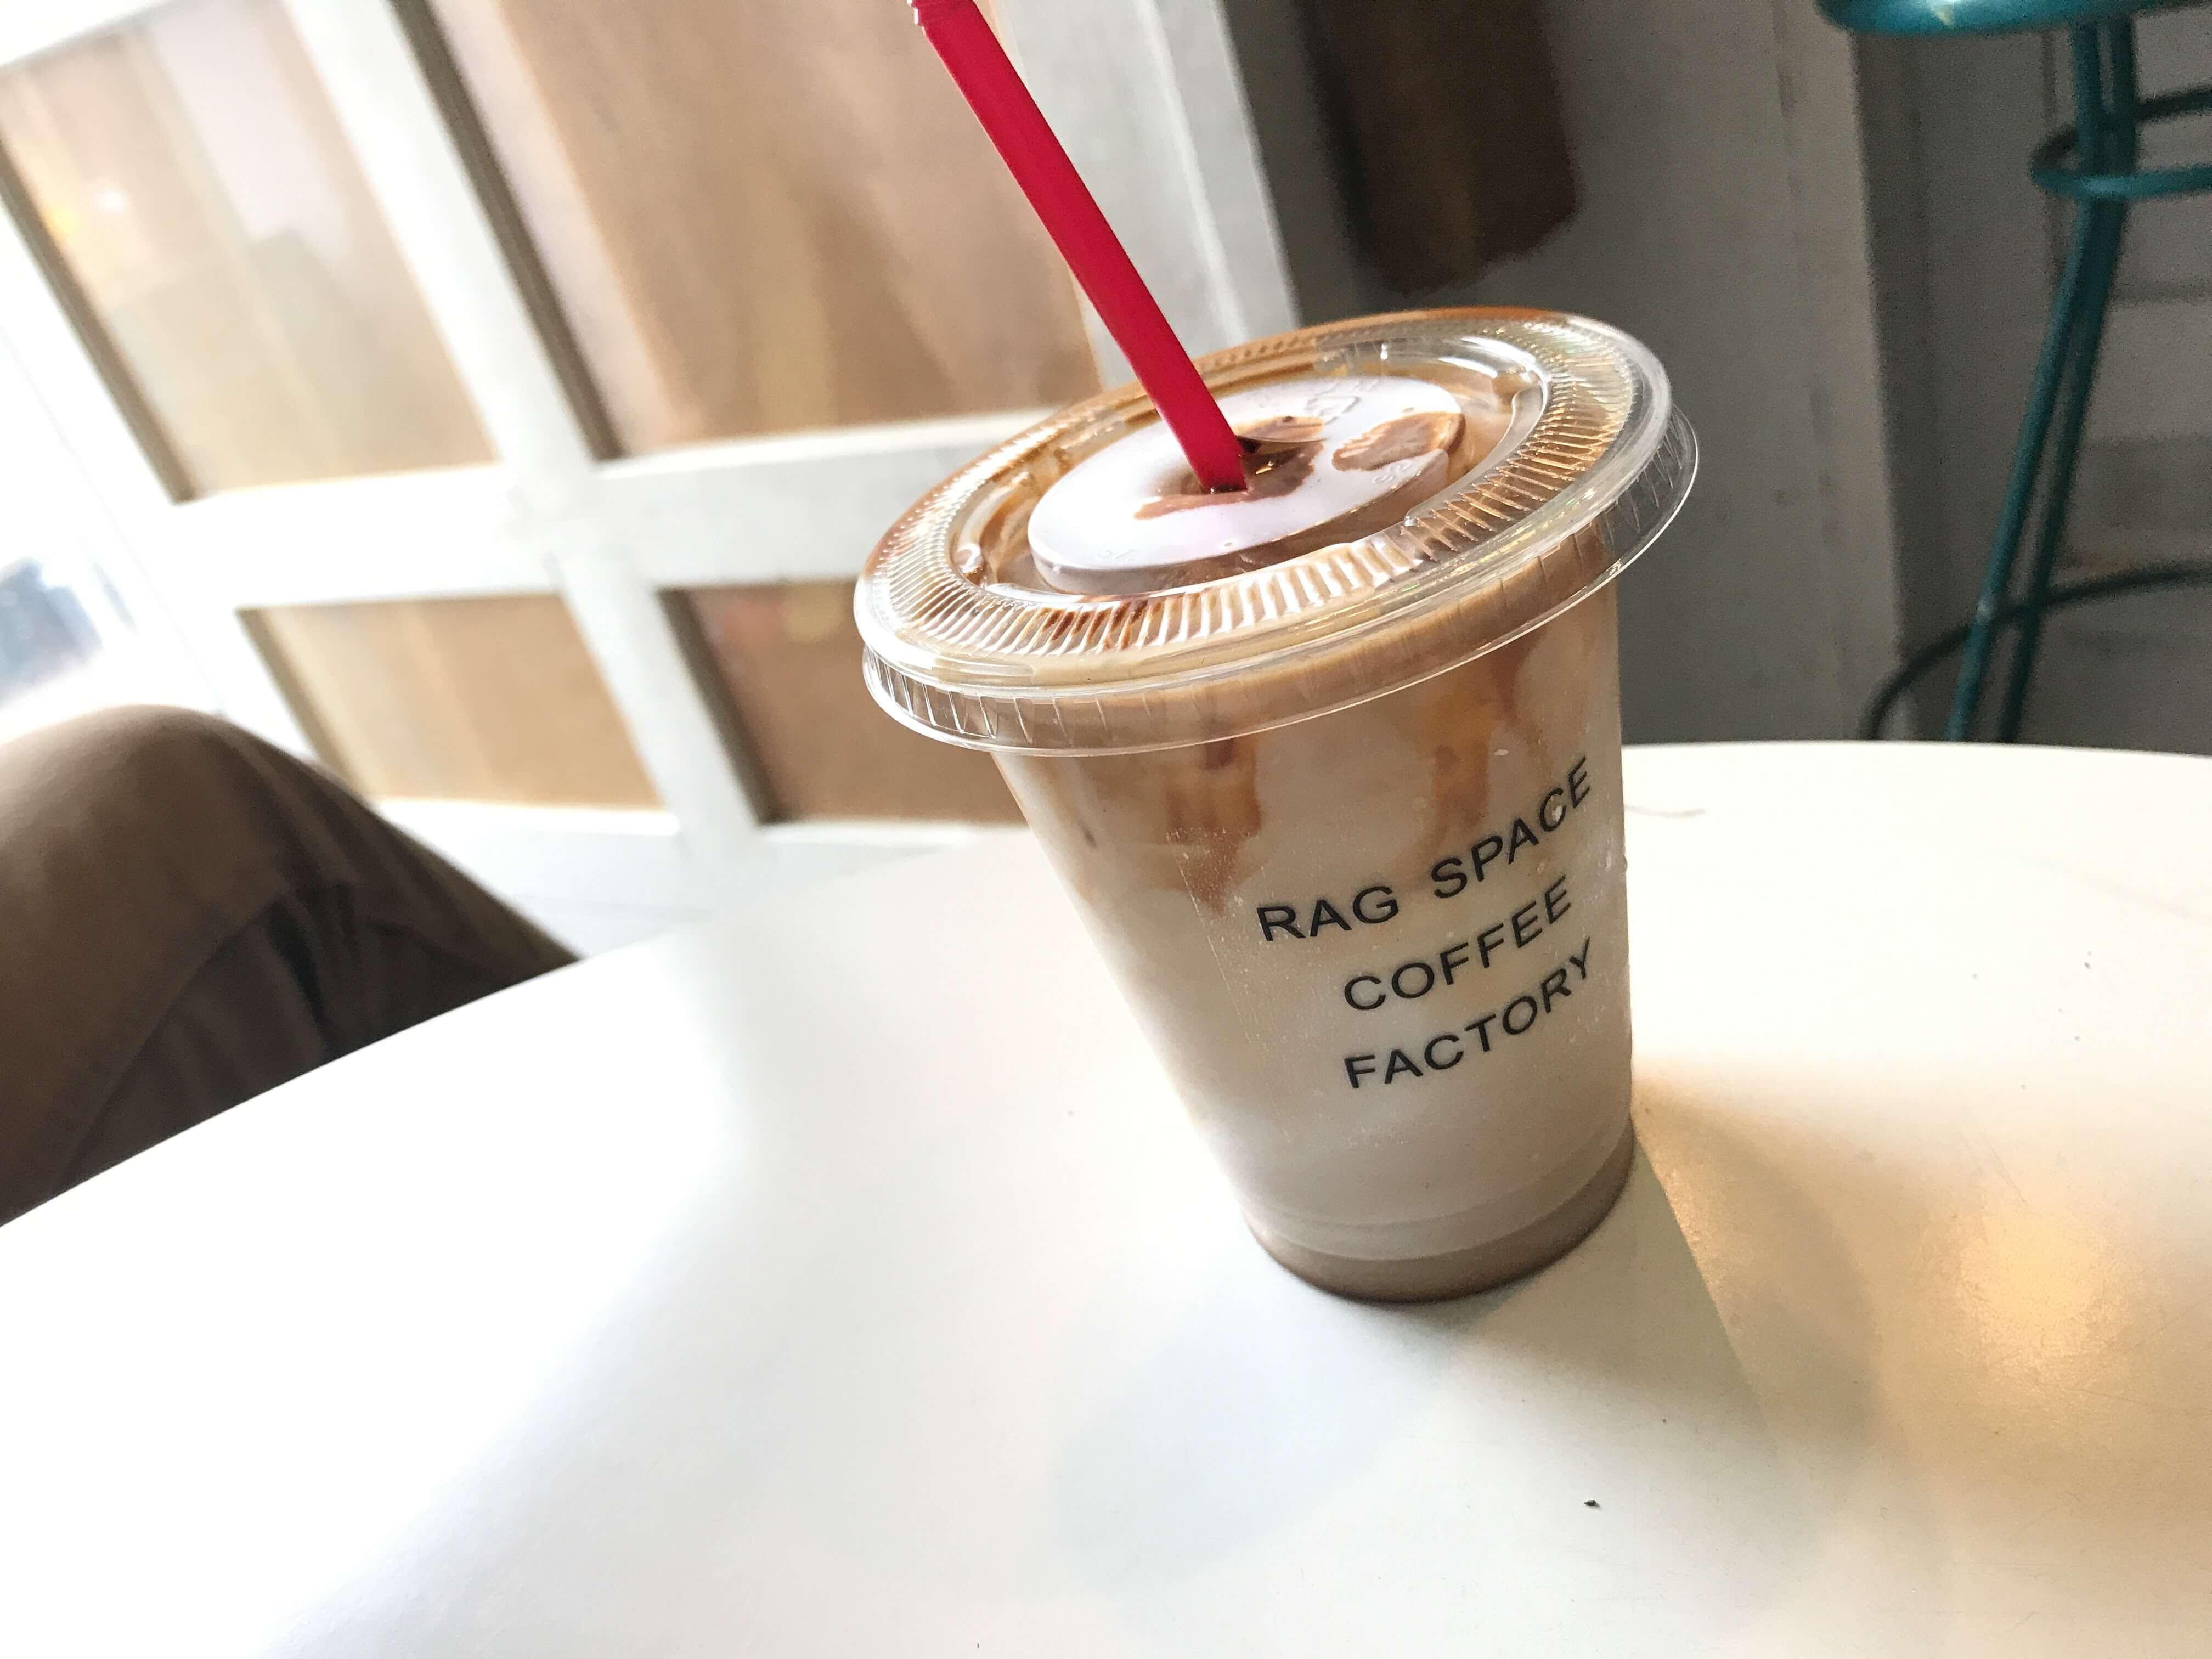 【RAGSPACE COFFEE FACTORY】路地裏のコーヒースタンド。夜中まで営業が嬉しい隠れ家カフェ。